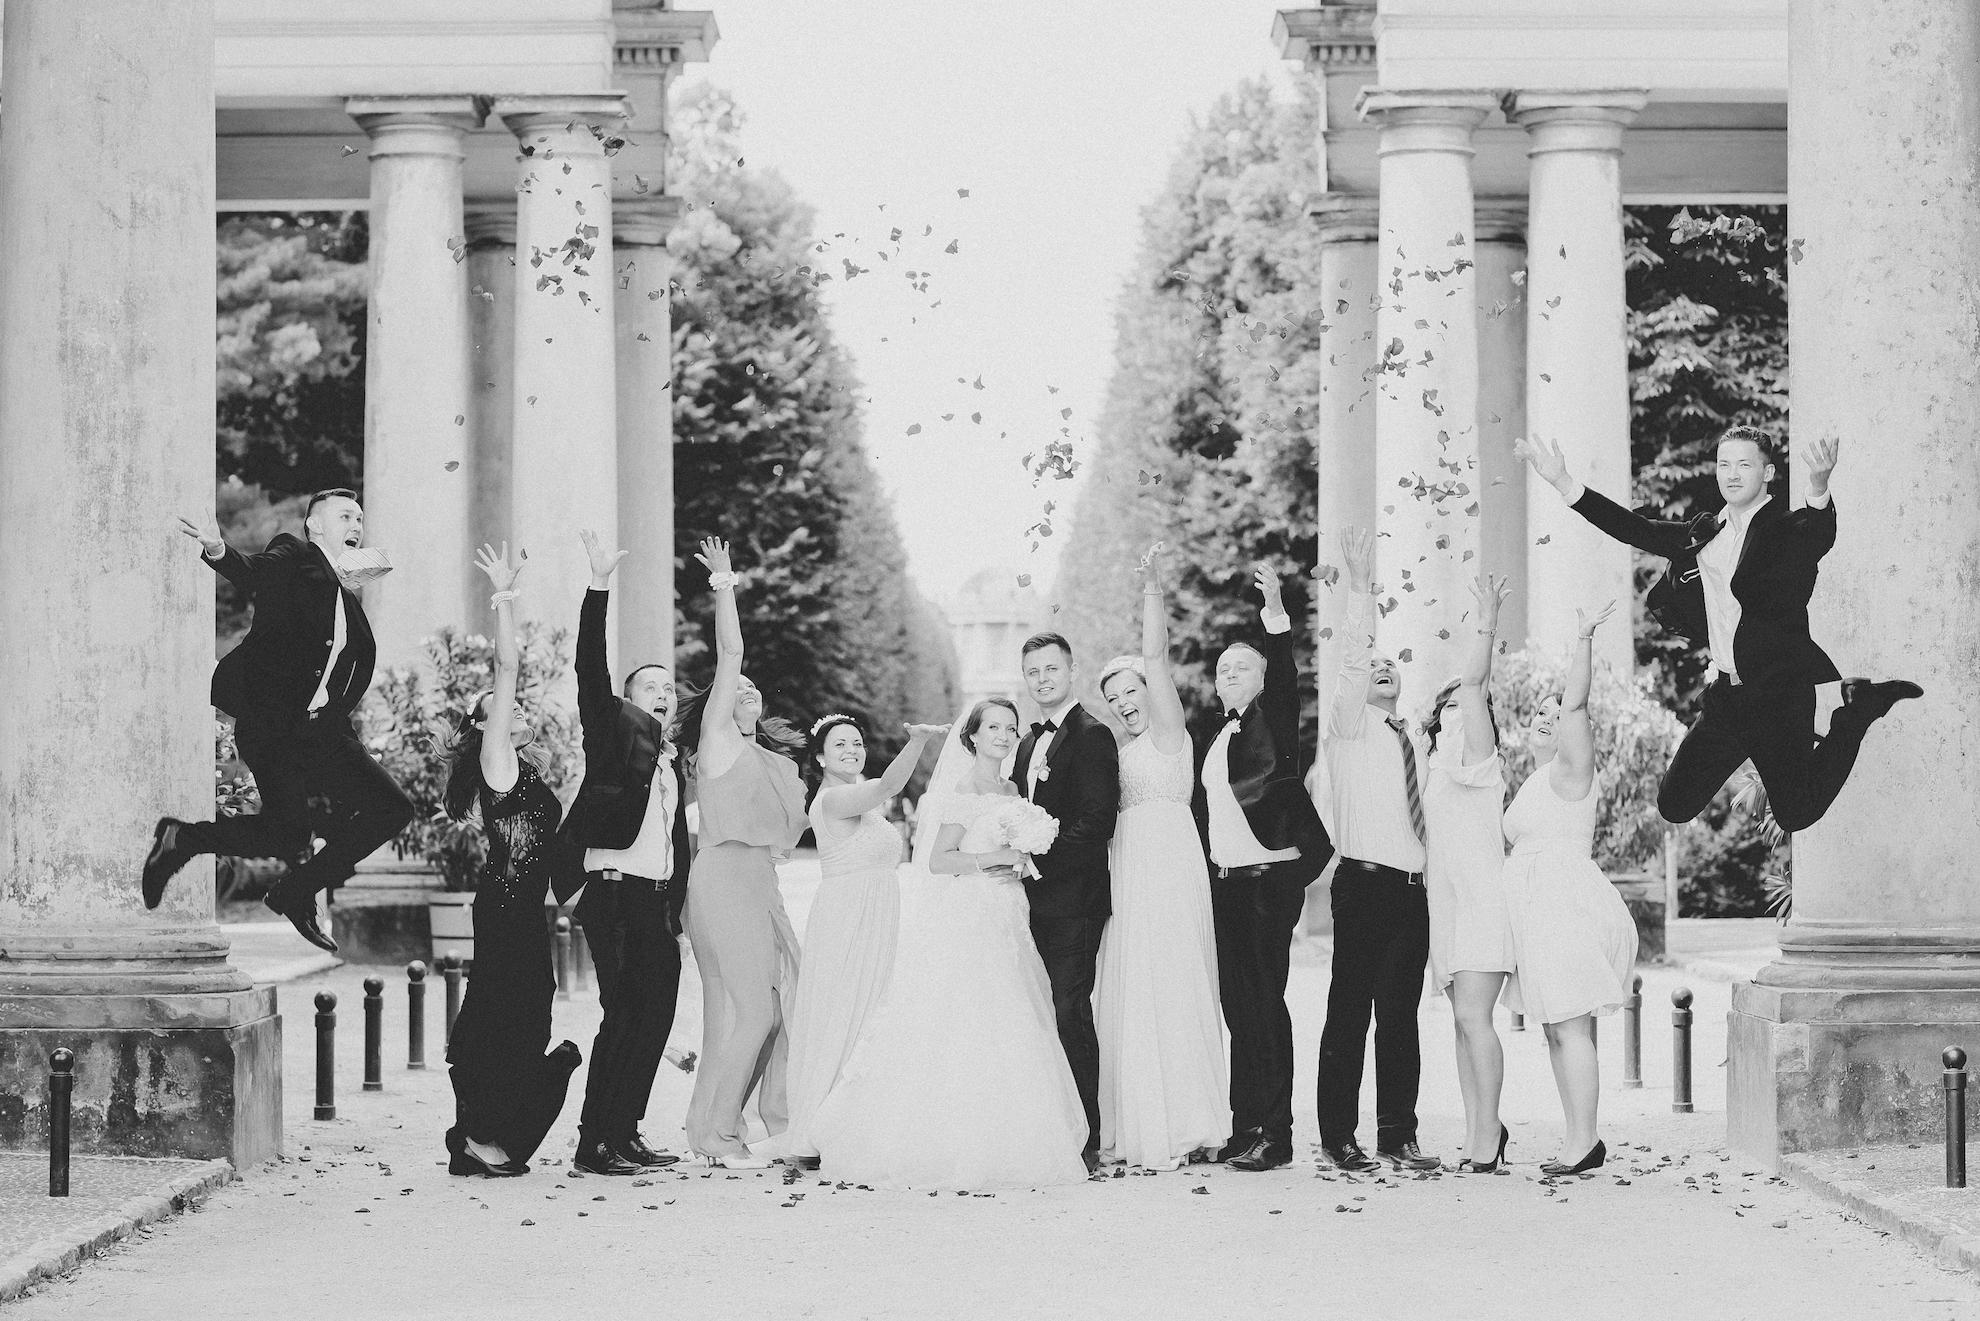 Hochzeitsfotograf Pavel Sepi.jpg